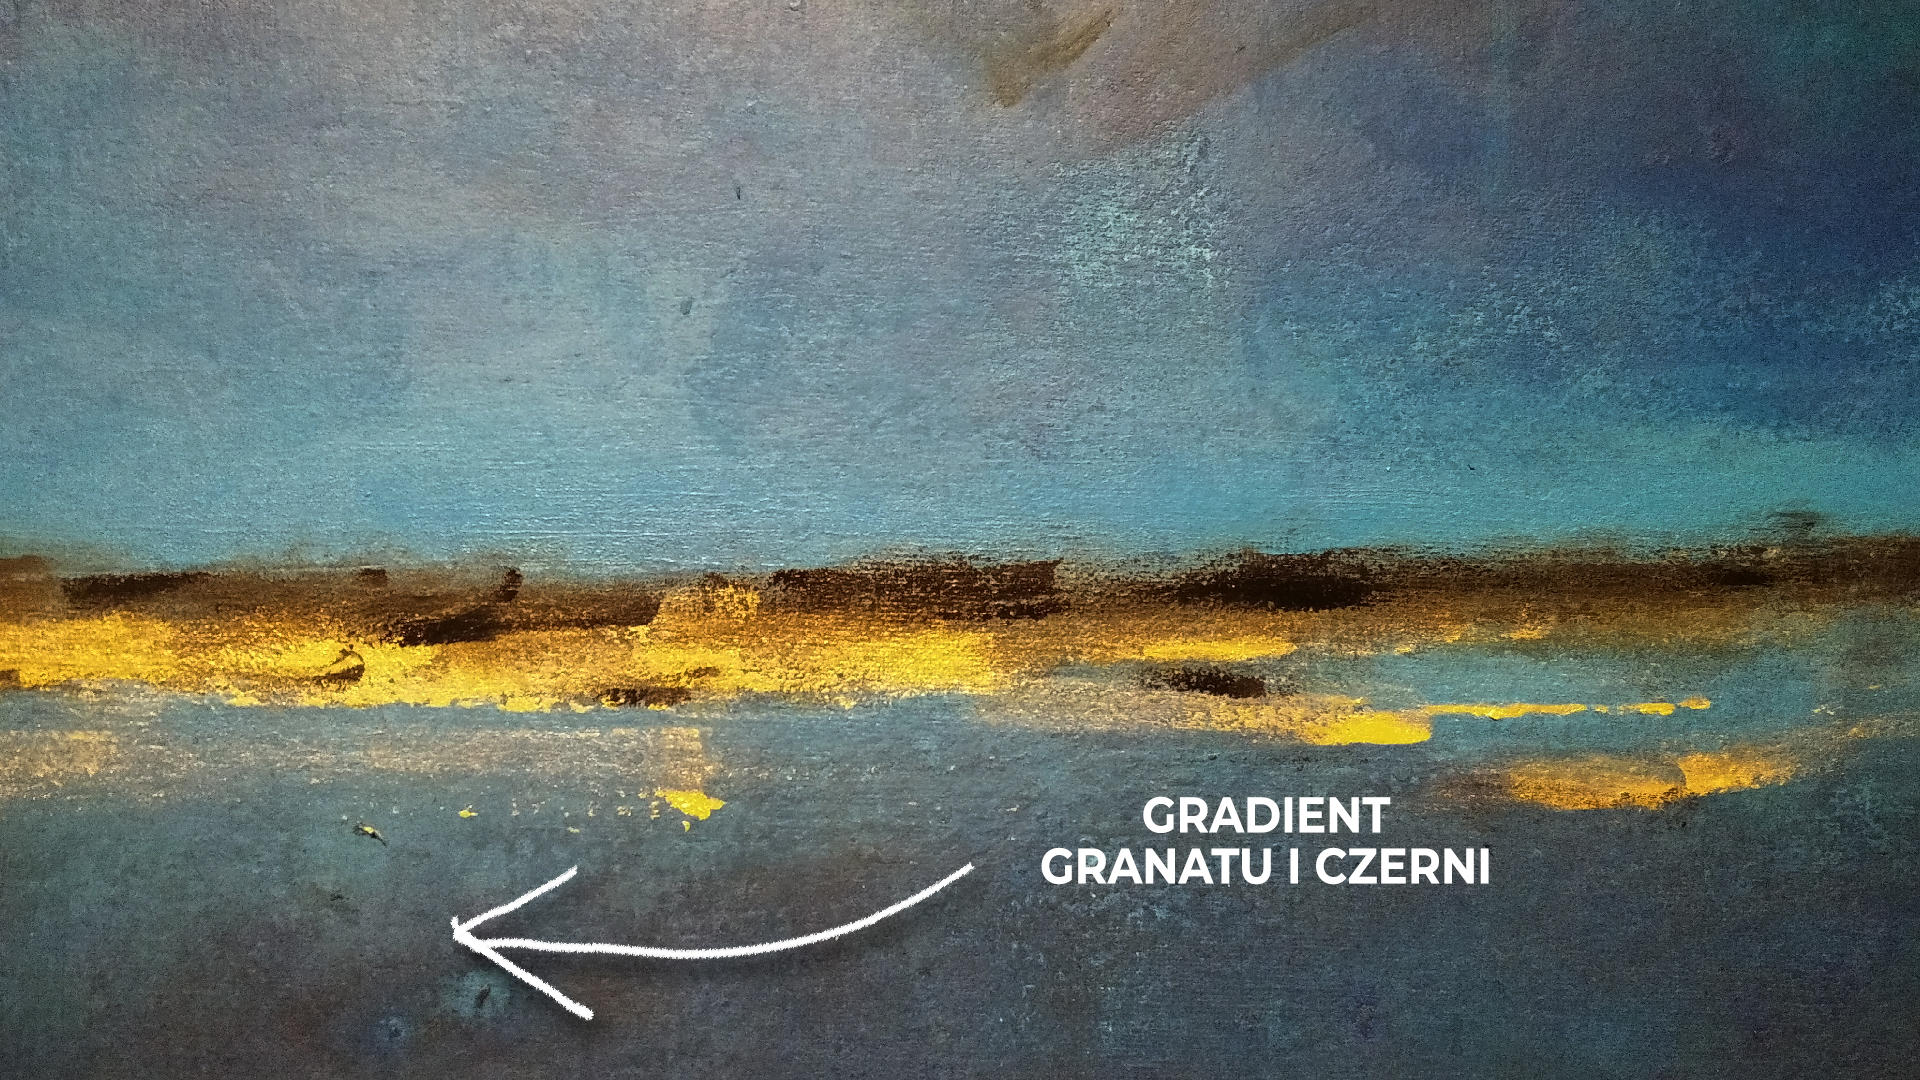 Obraz Akrylowy Brzeg Morski 60 x 80 cm detal 1